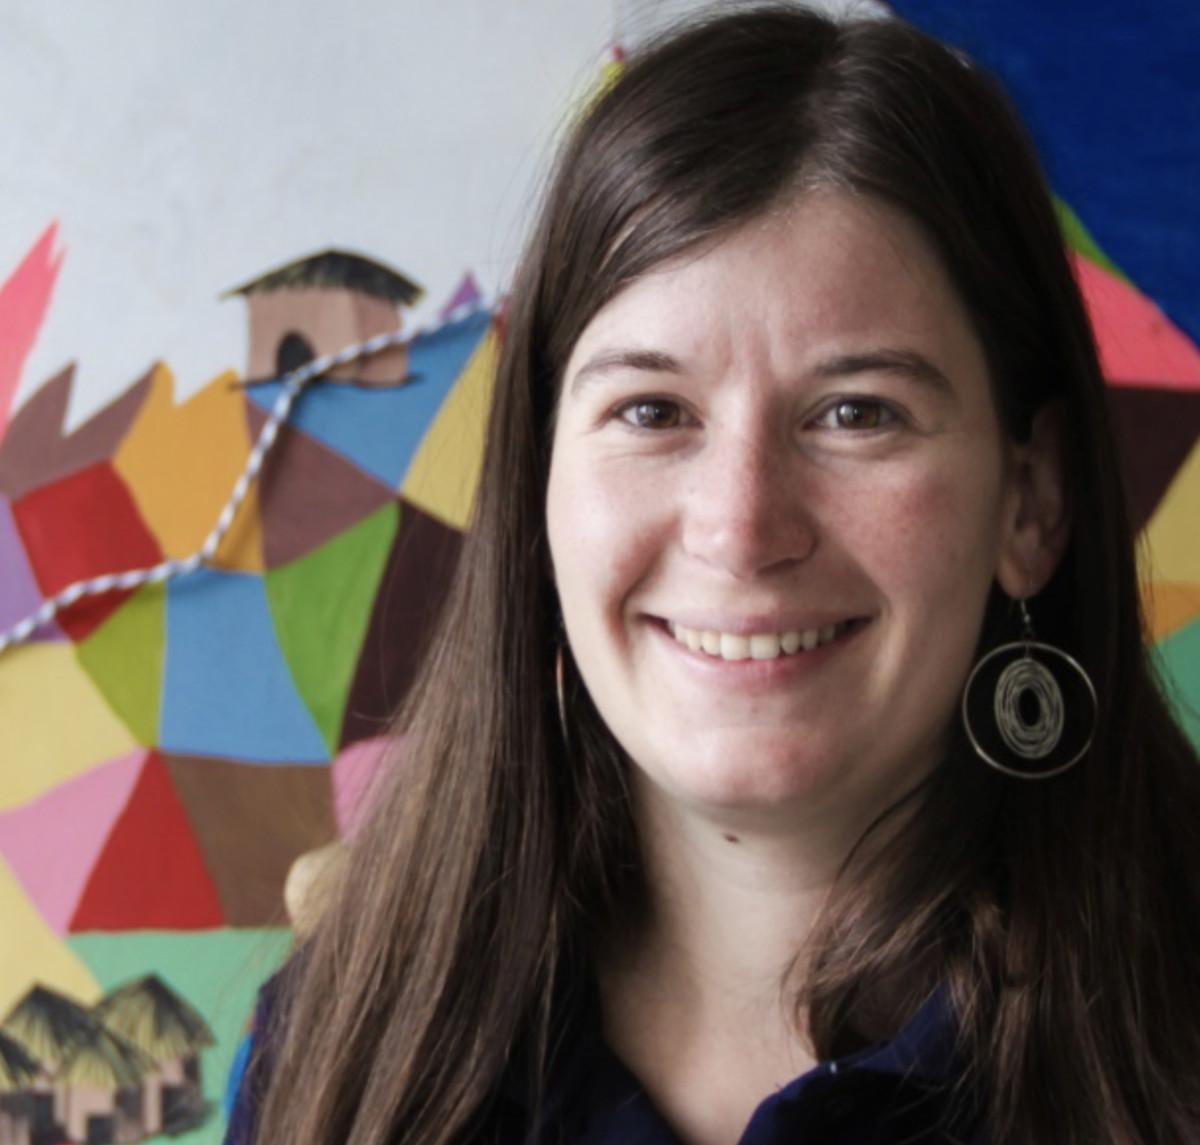 Global Glimpse Team - Emily Stuyvers